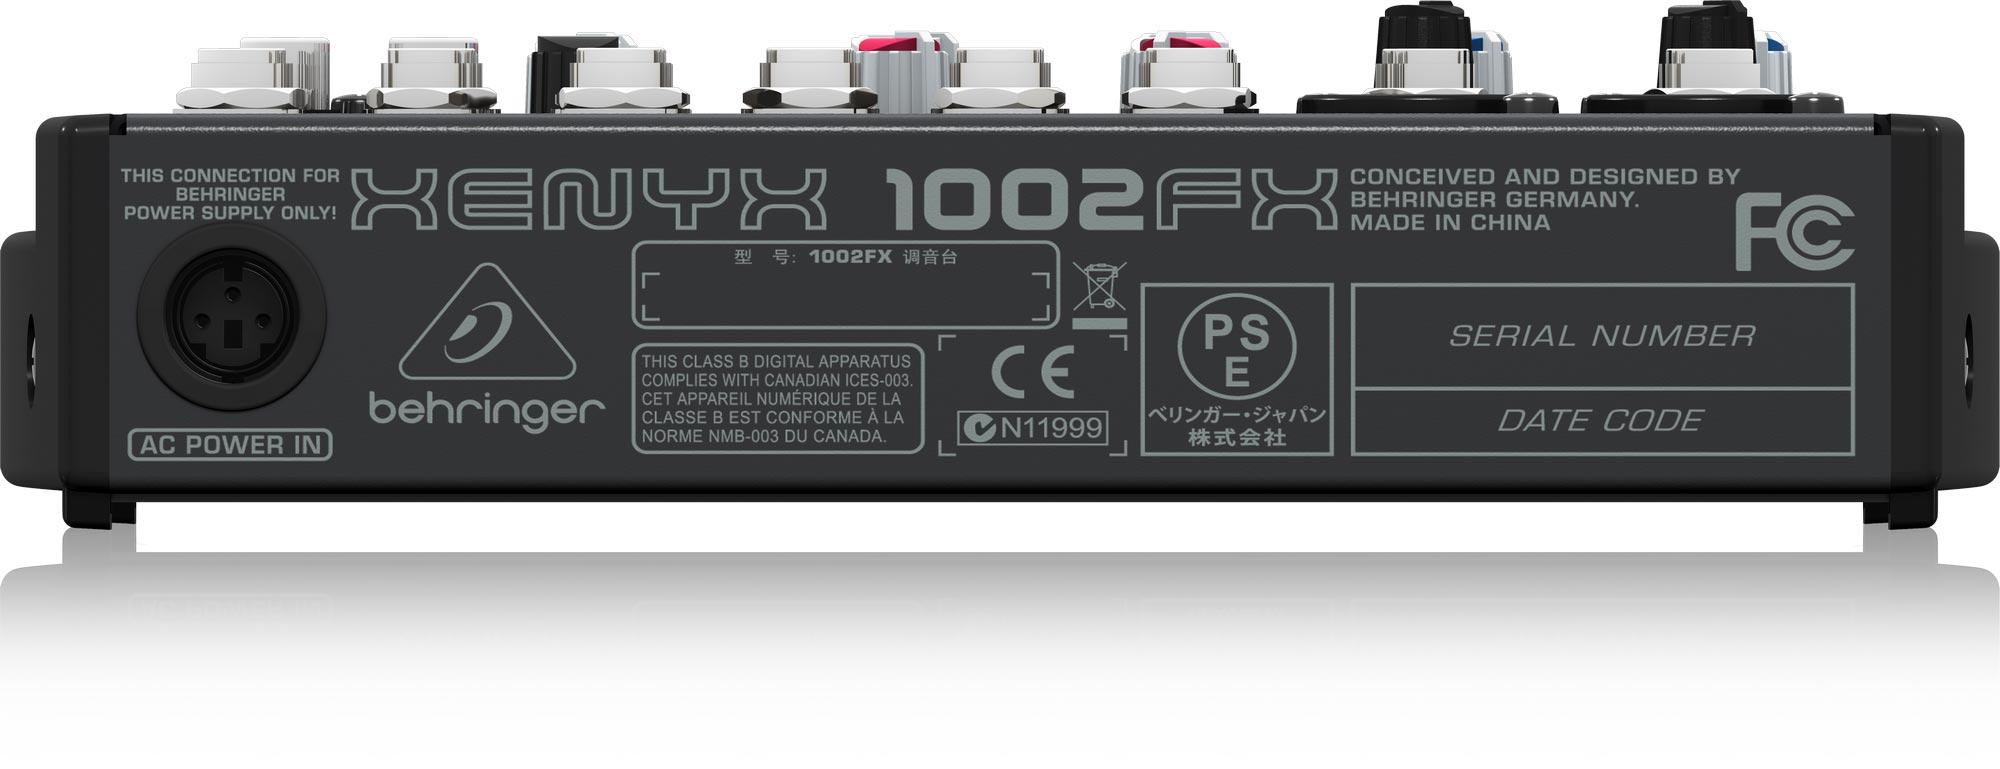 Mixer Behringer 1002FX